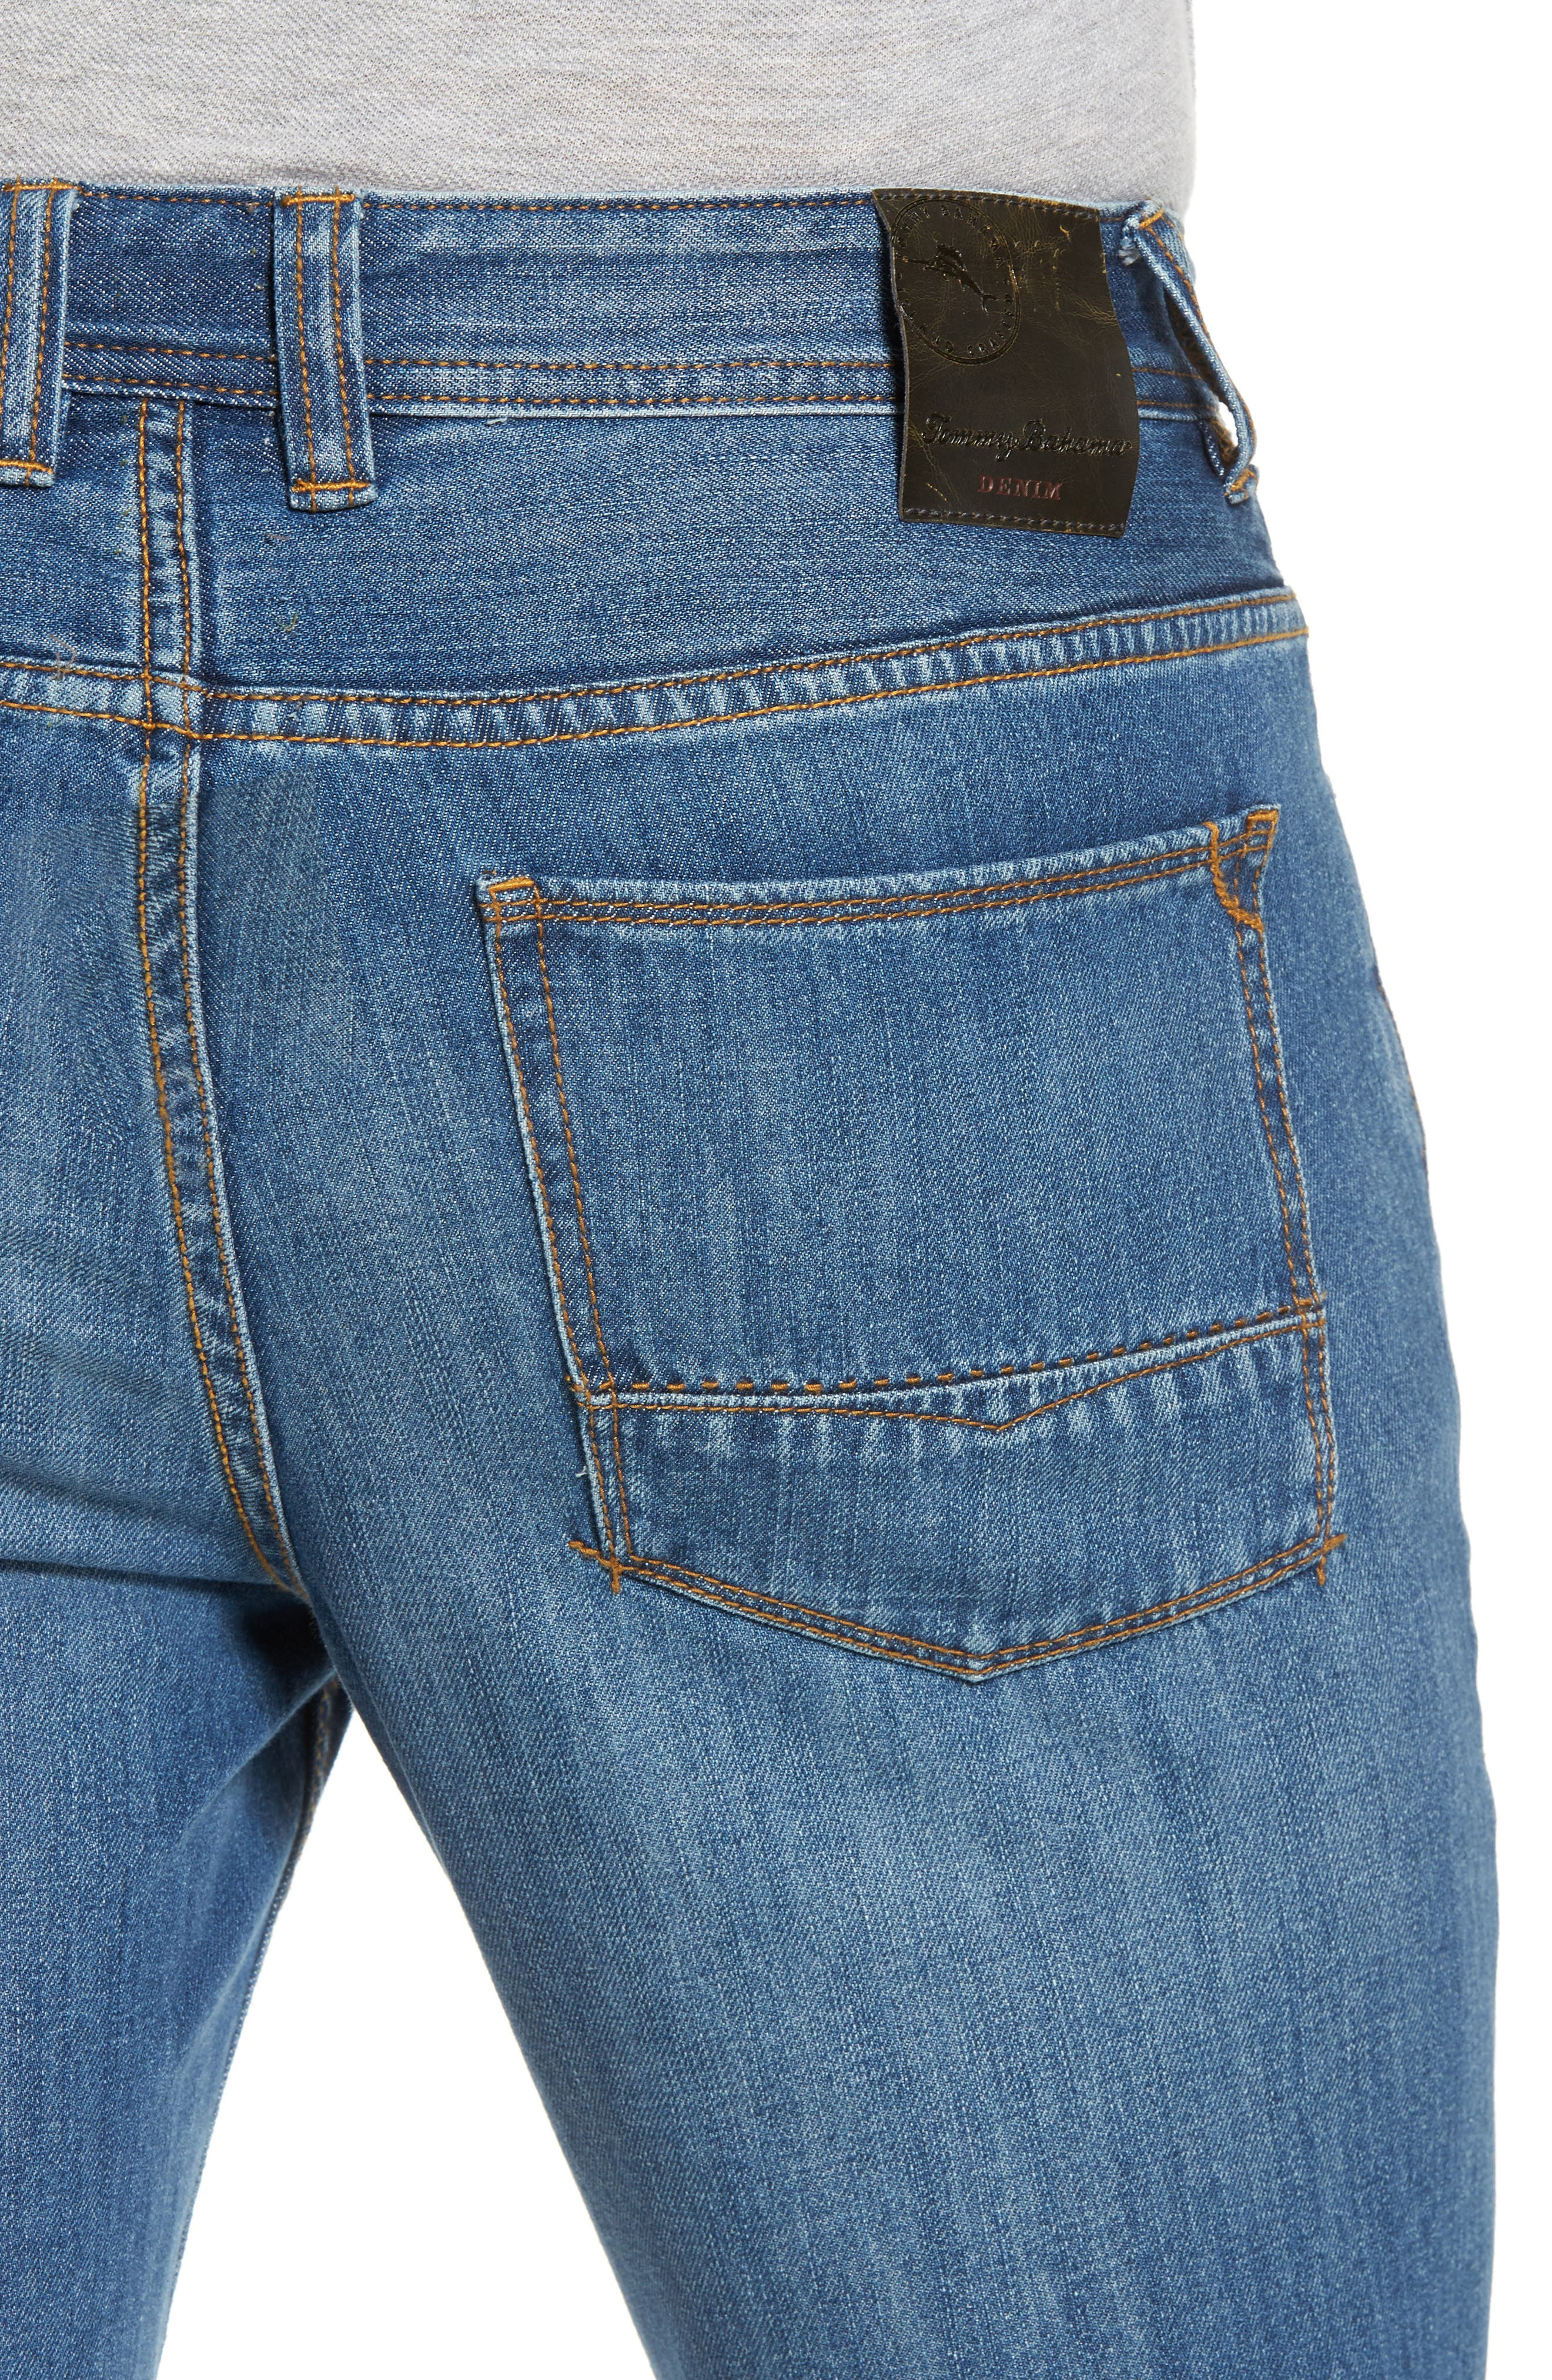 Bardabos Straight Leg Jeans,                             Alternate thumbnail 9, color,